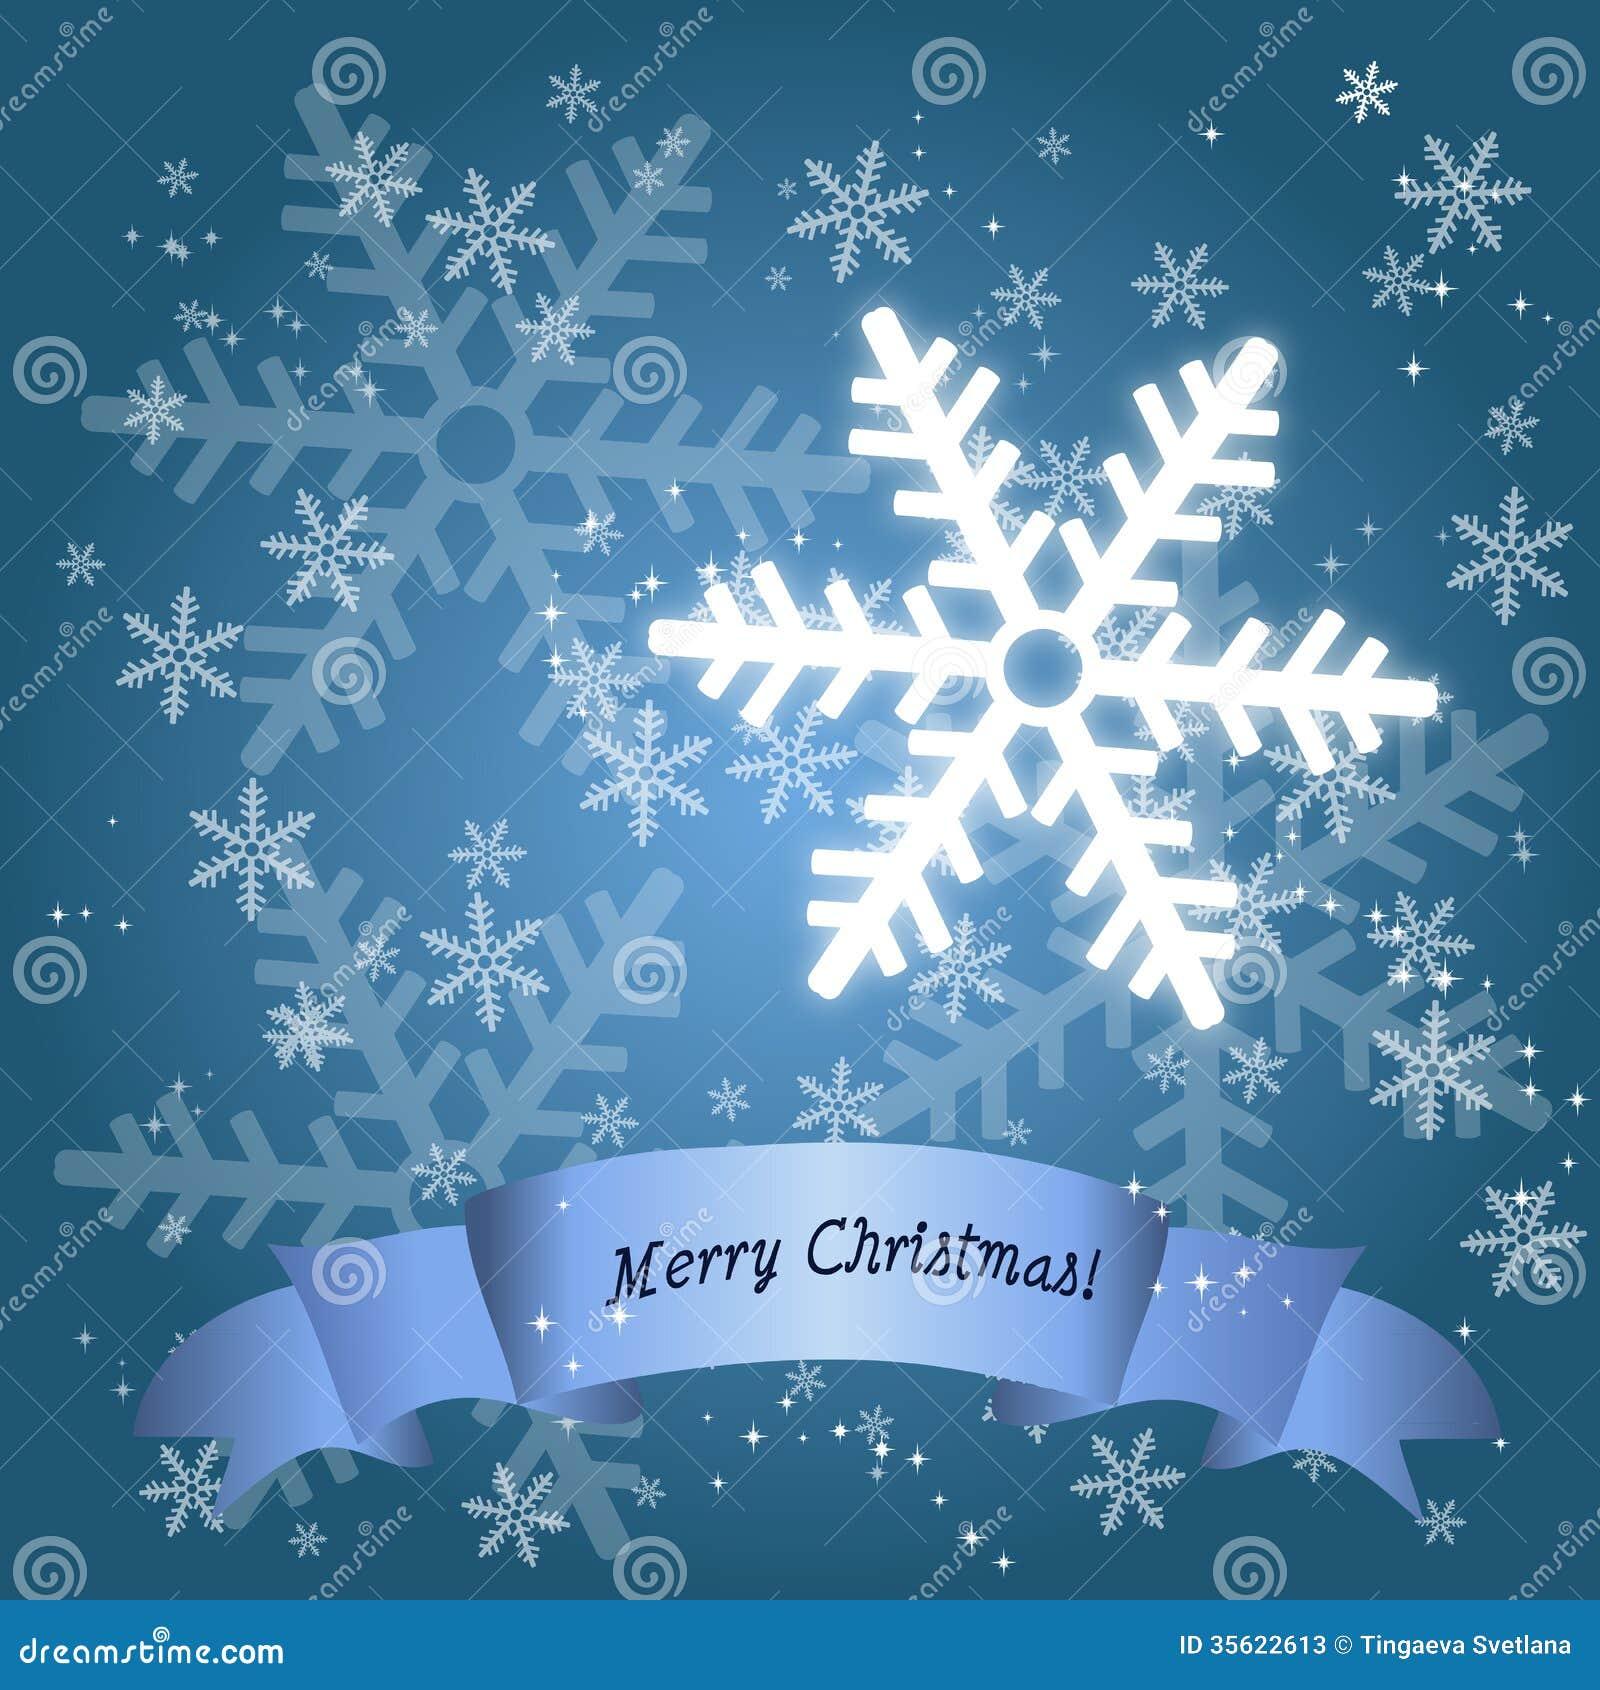 holiday season snow flake card stock photos image 35622613 snowflakes clip art and dancers snowflake clipart border